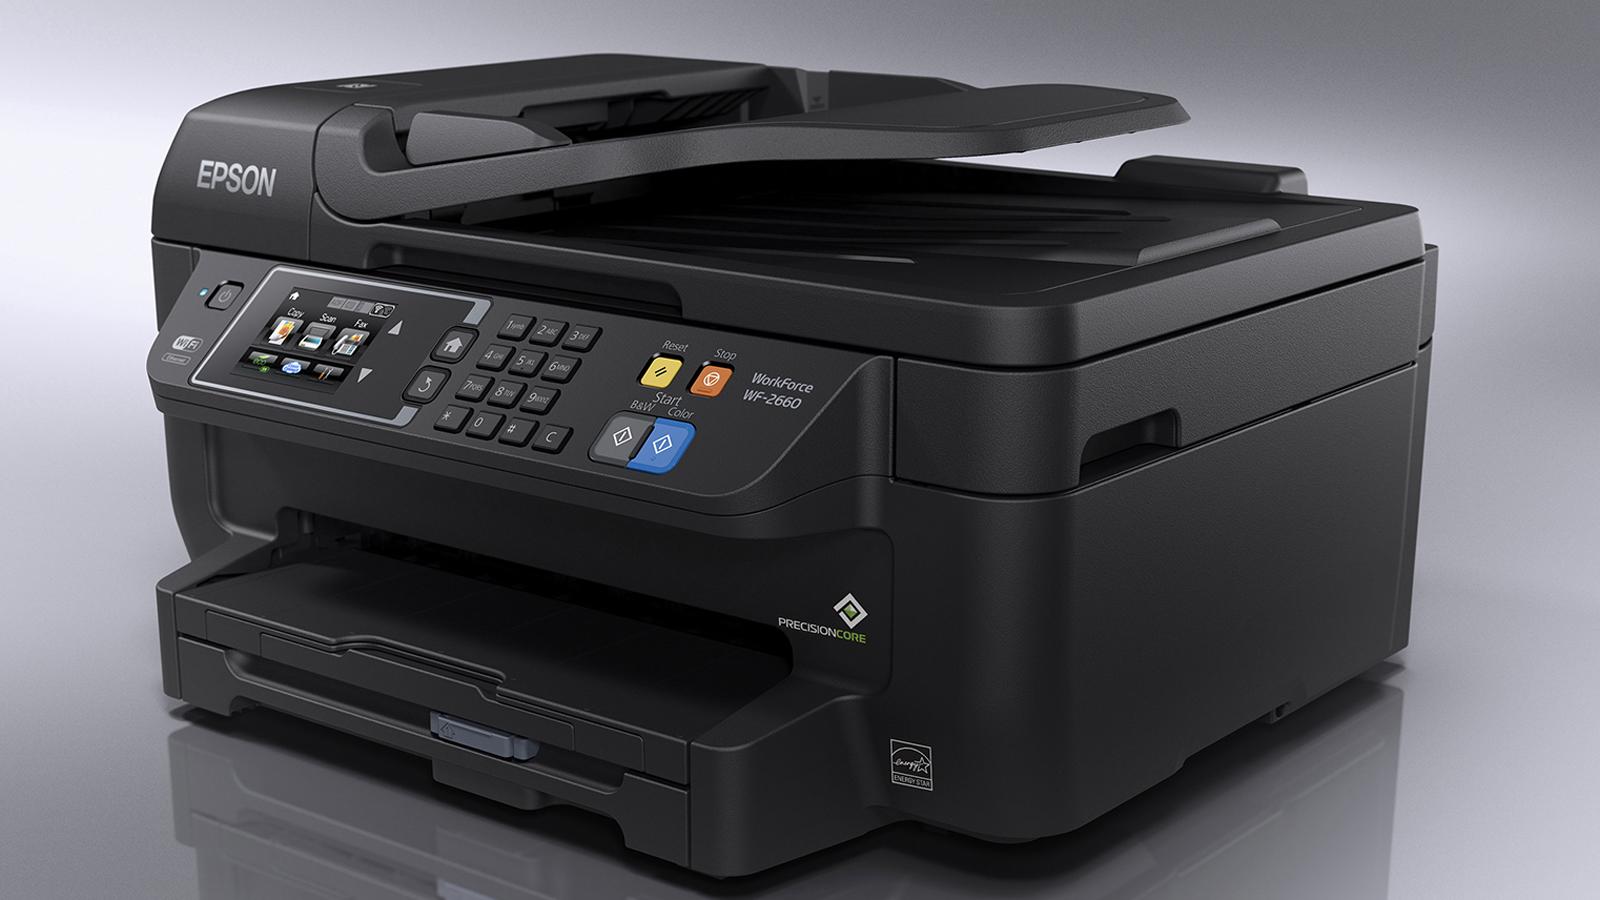 Epson WorkForce WF-2660 | TechRadar